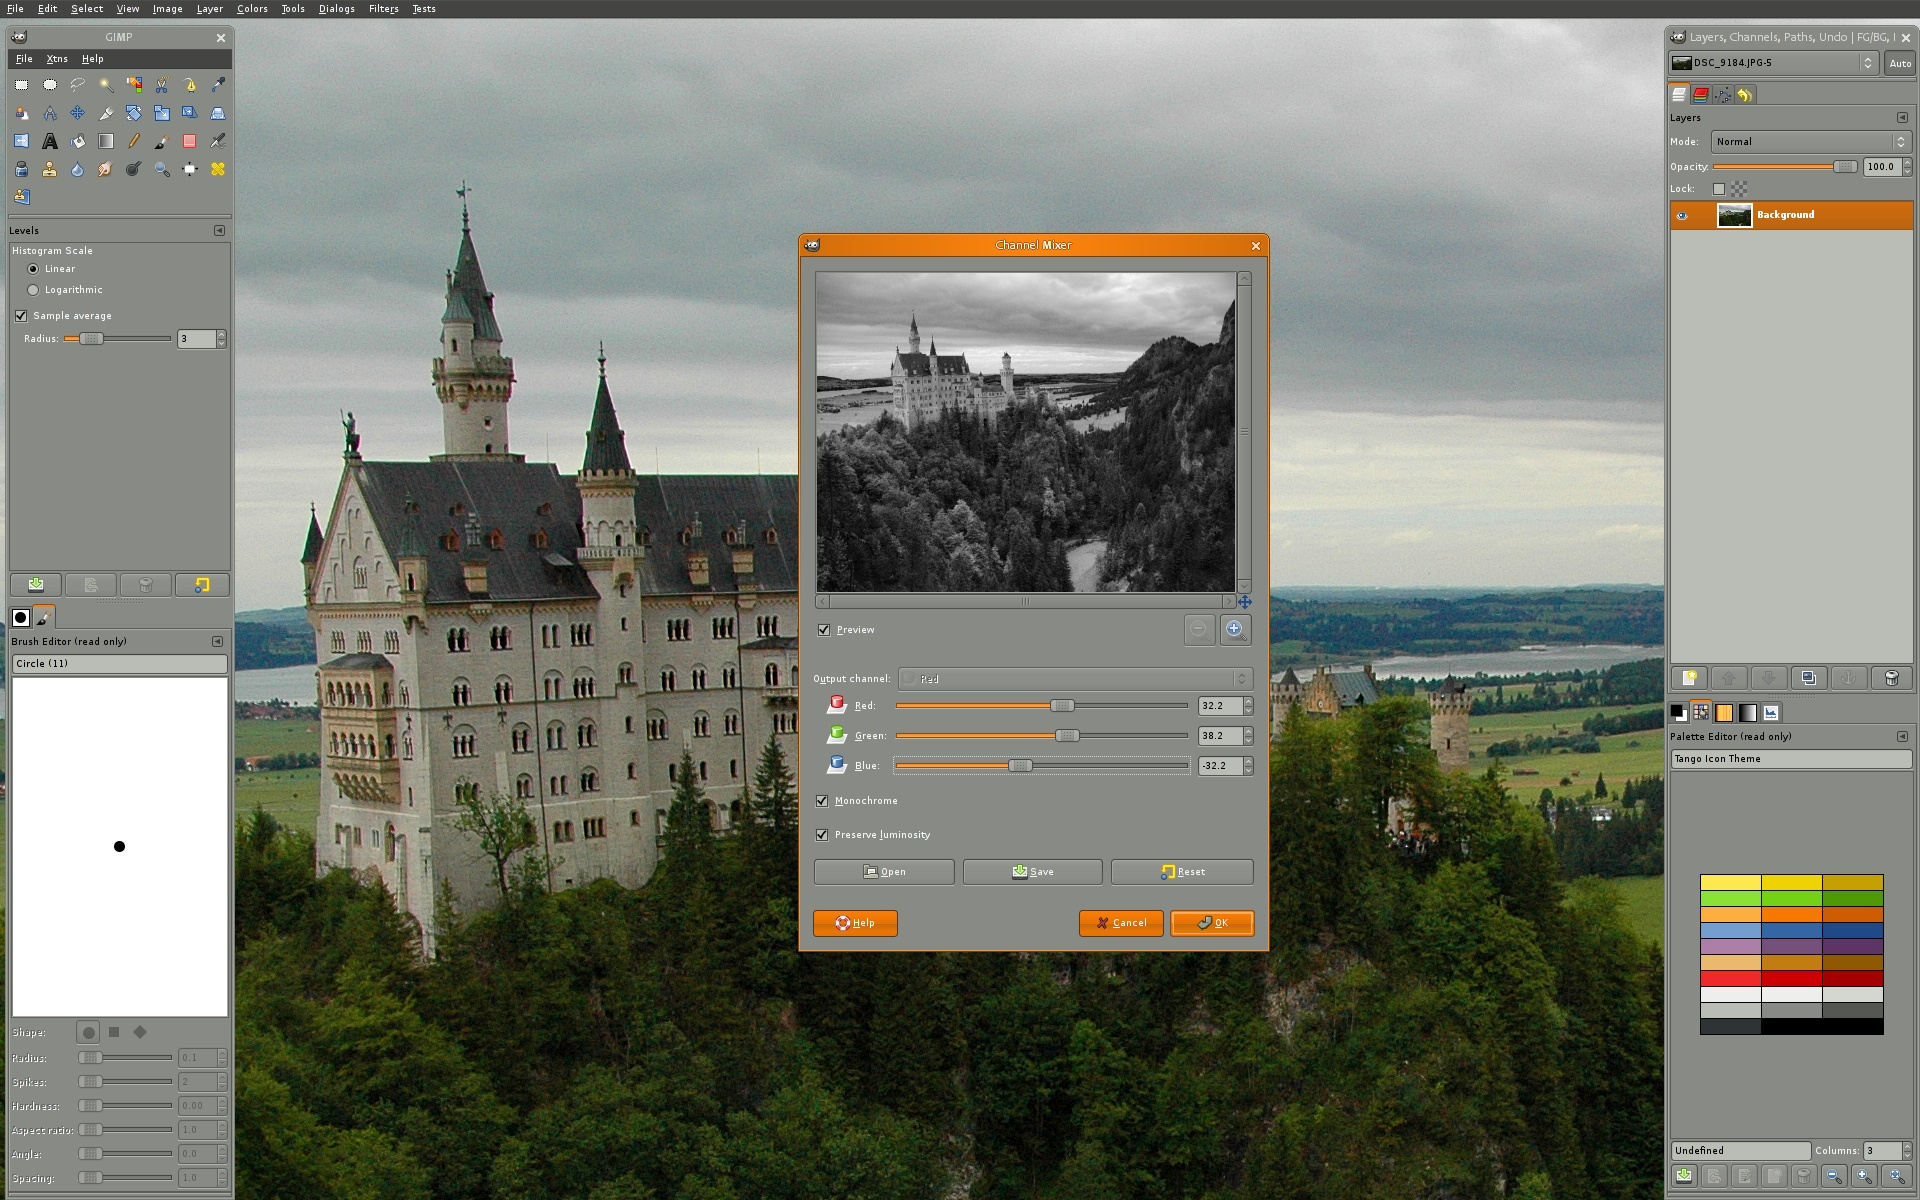 GIMP - Image Manipulation Tool for Windows-Linux-Mac